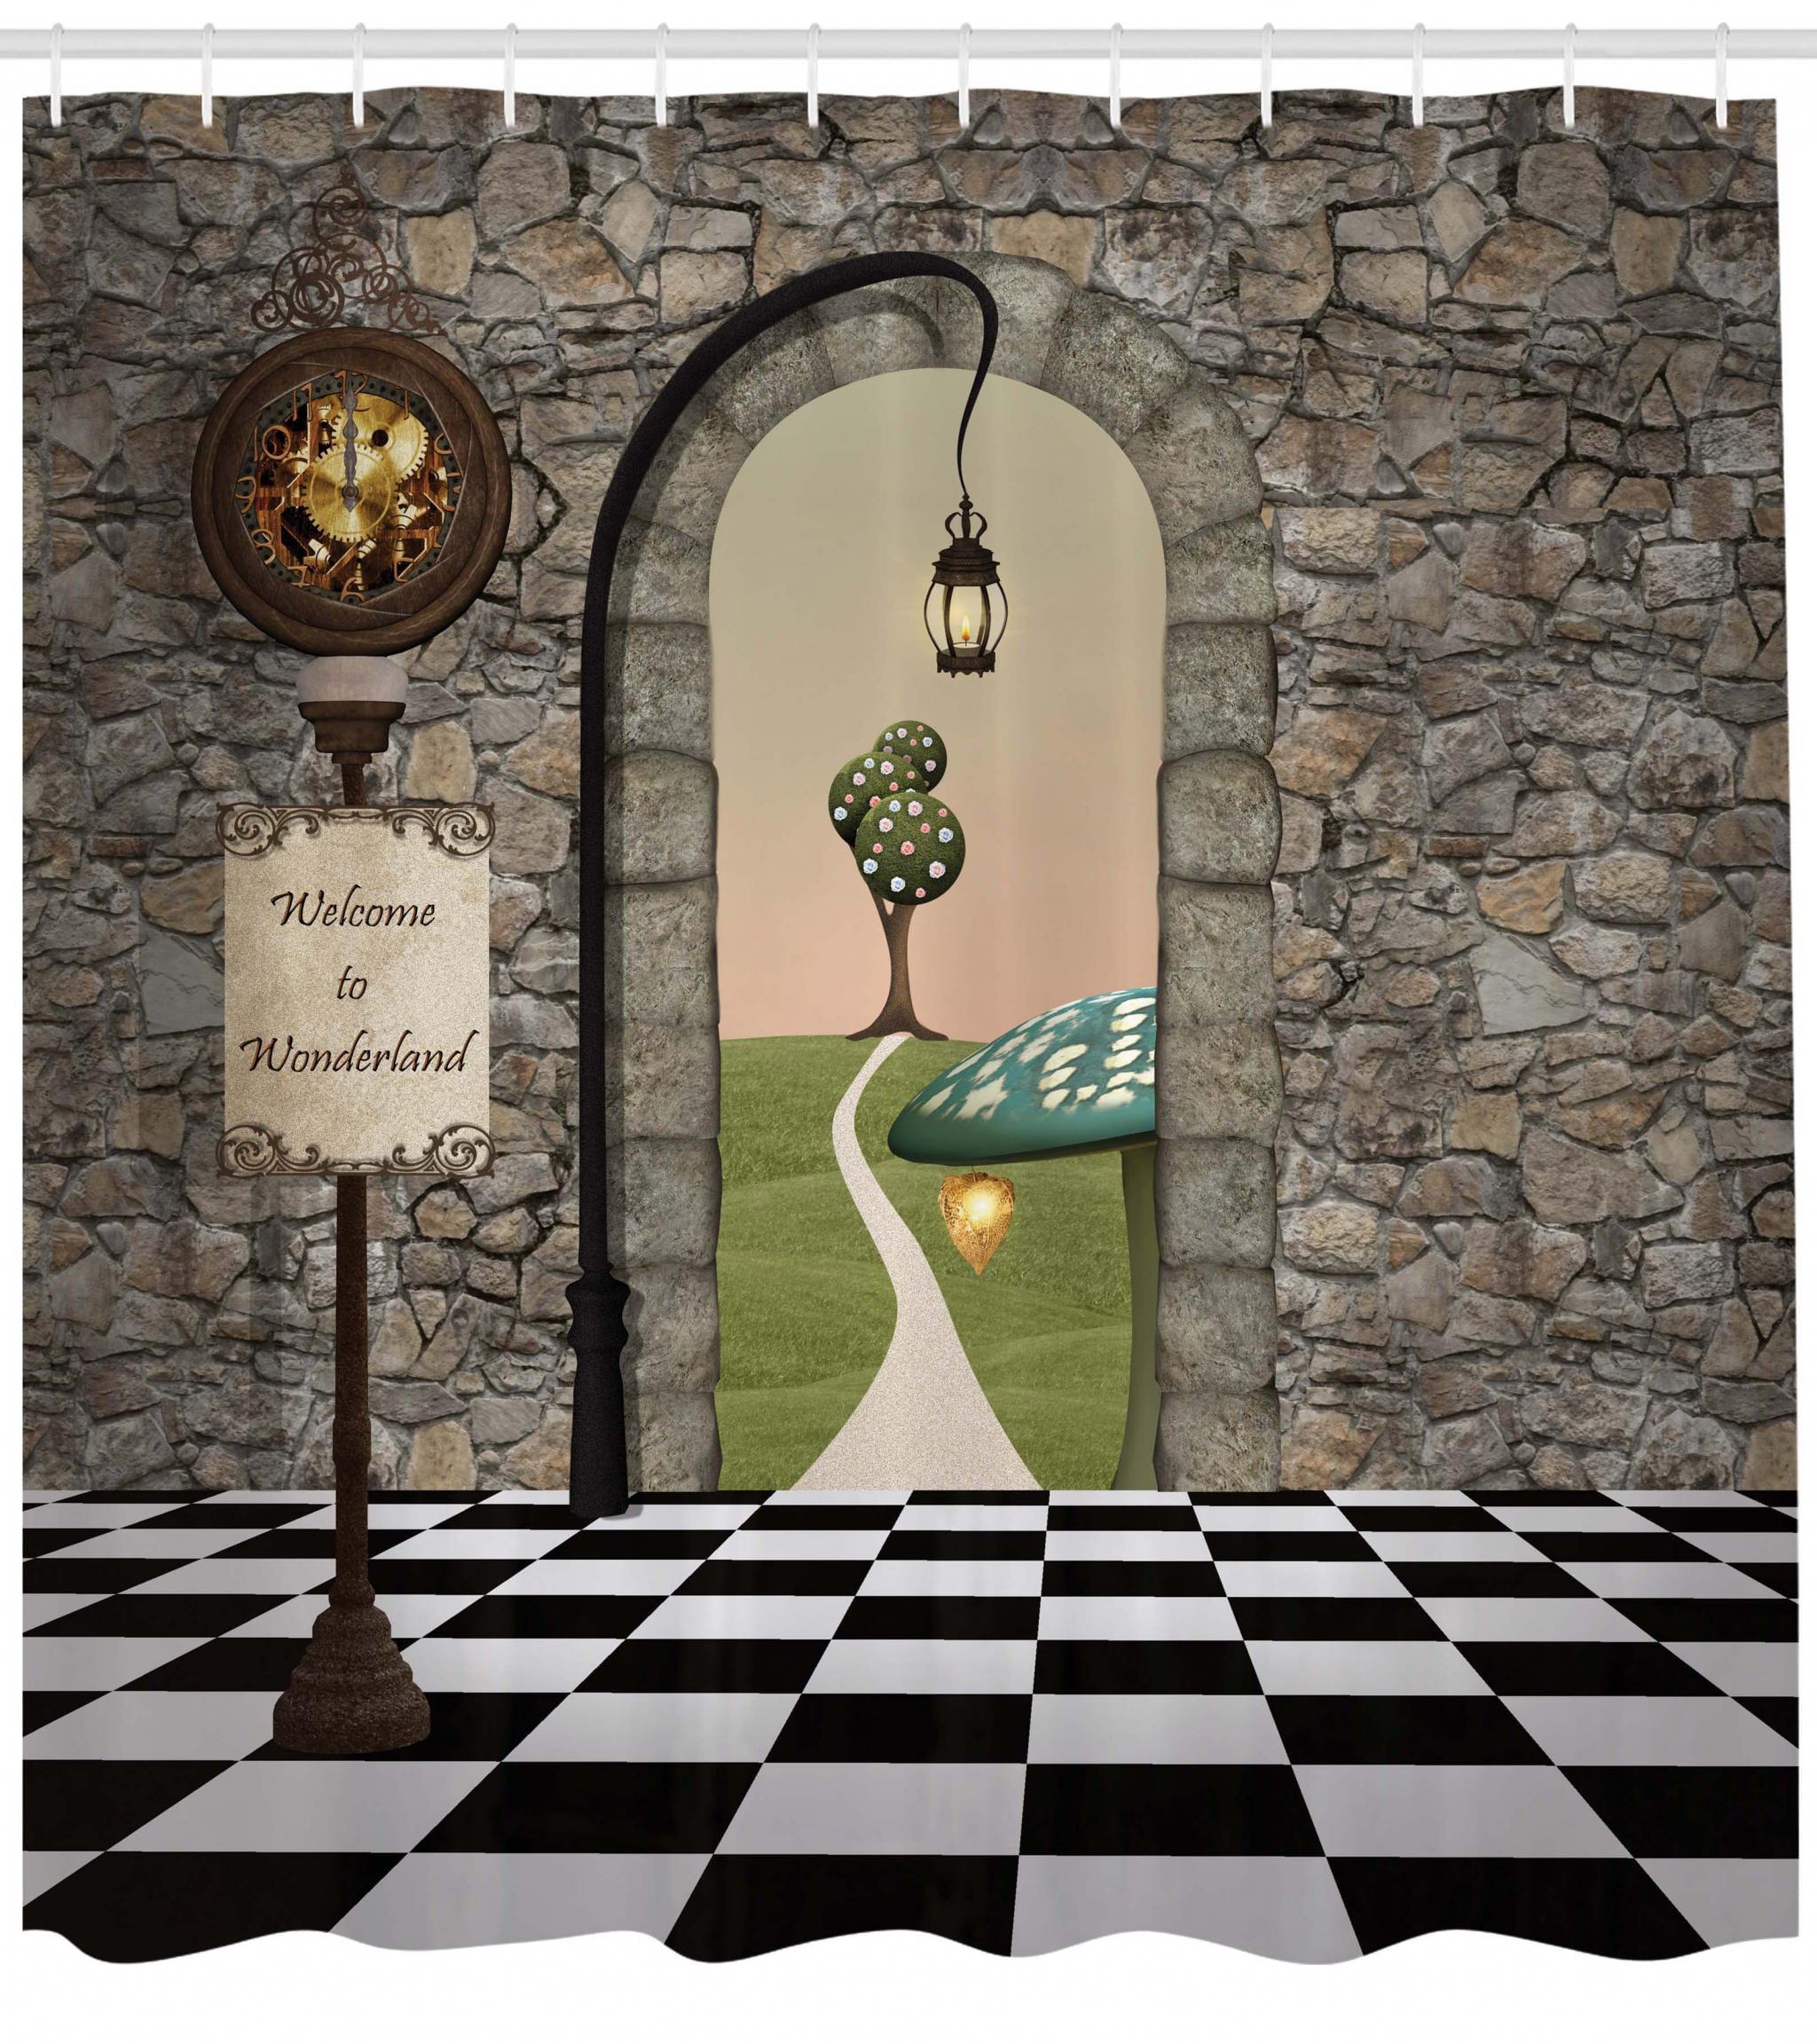 Alice In Wonderland Shower Curtain Welcome Black And White Floor Landscape Mushroom Lantern Fabric Bathroom Set With Hooks Multicolor